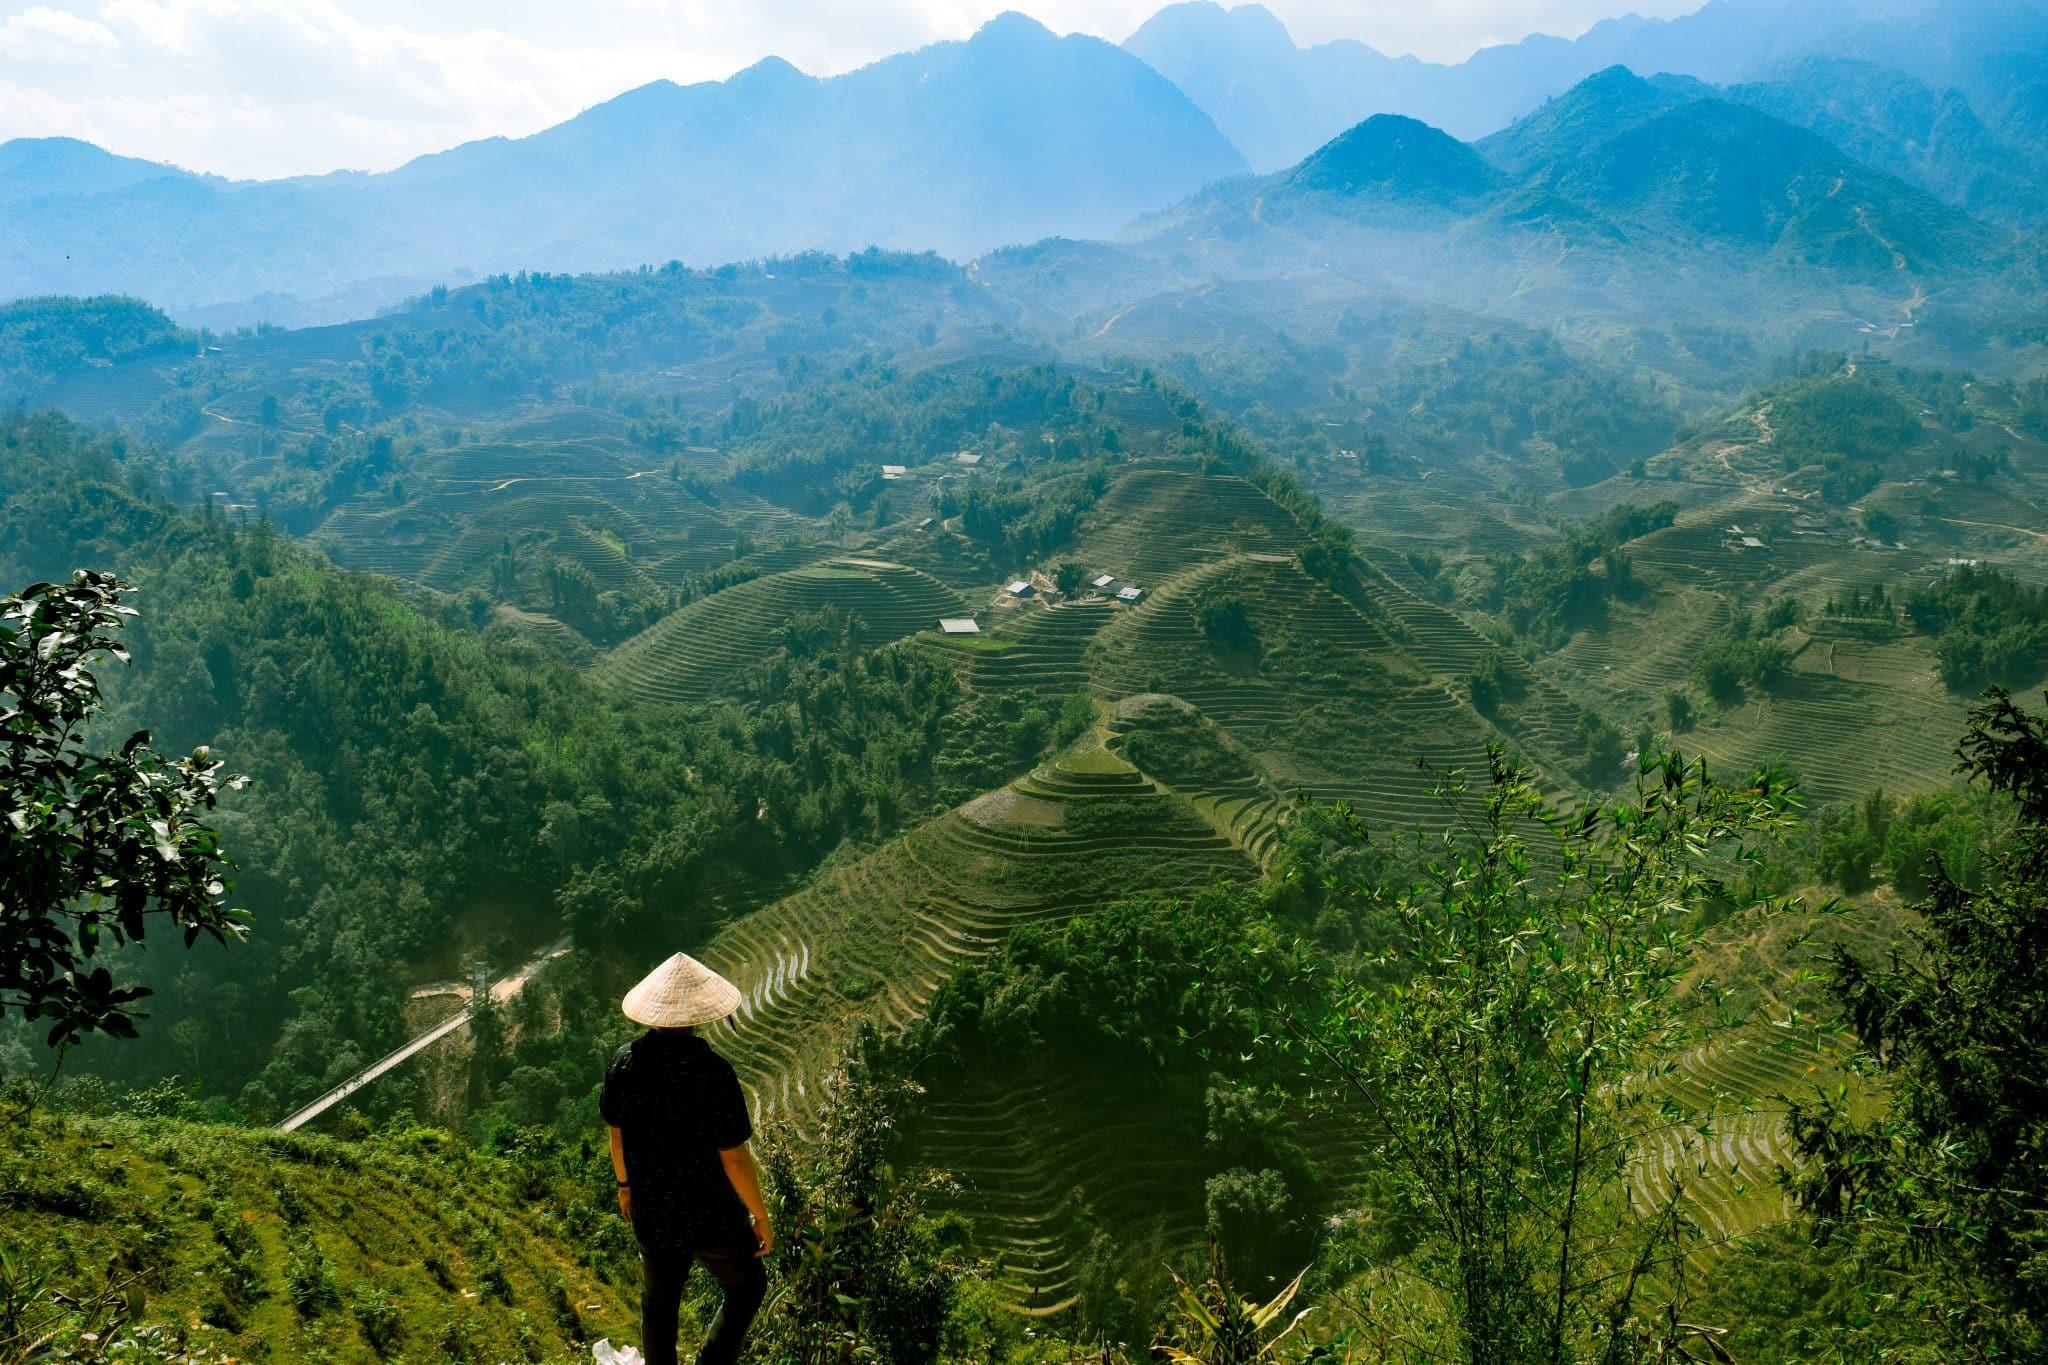 Sapa Trek, Trekking in Sapa, Sa Pa Vietnam, How to trek in Sa Pa, Things to do in Sa Pa, Tips for your trek in Sa Pa, great tips Sa Pa, Mooie trek in Sa Pa, How to trek in Sapa without a guide